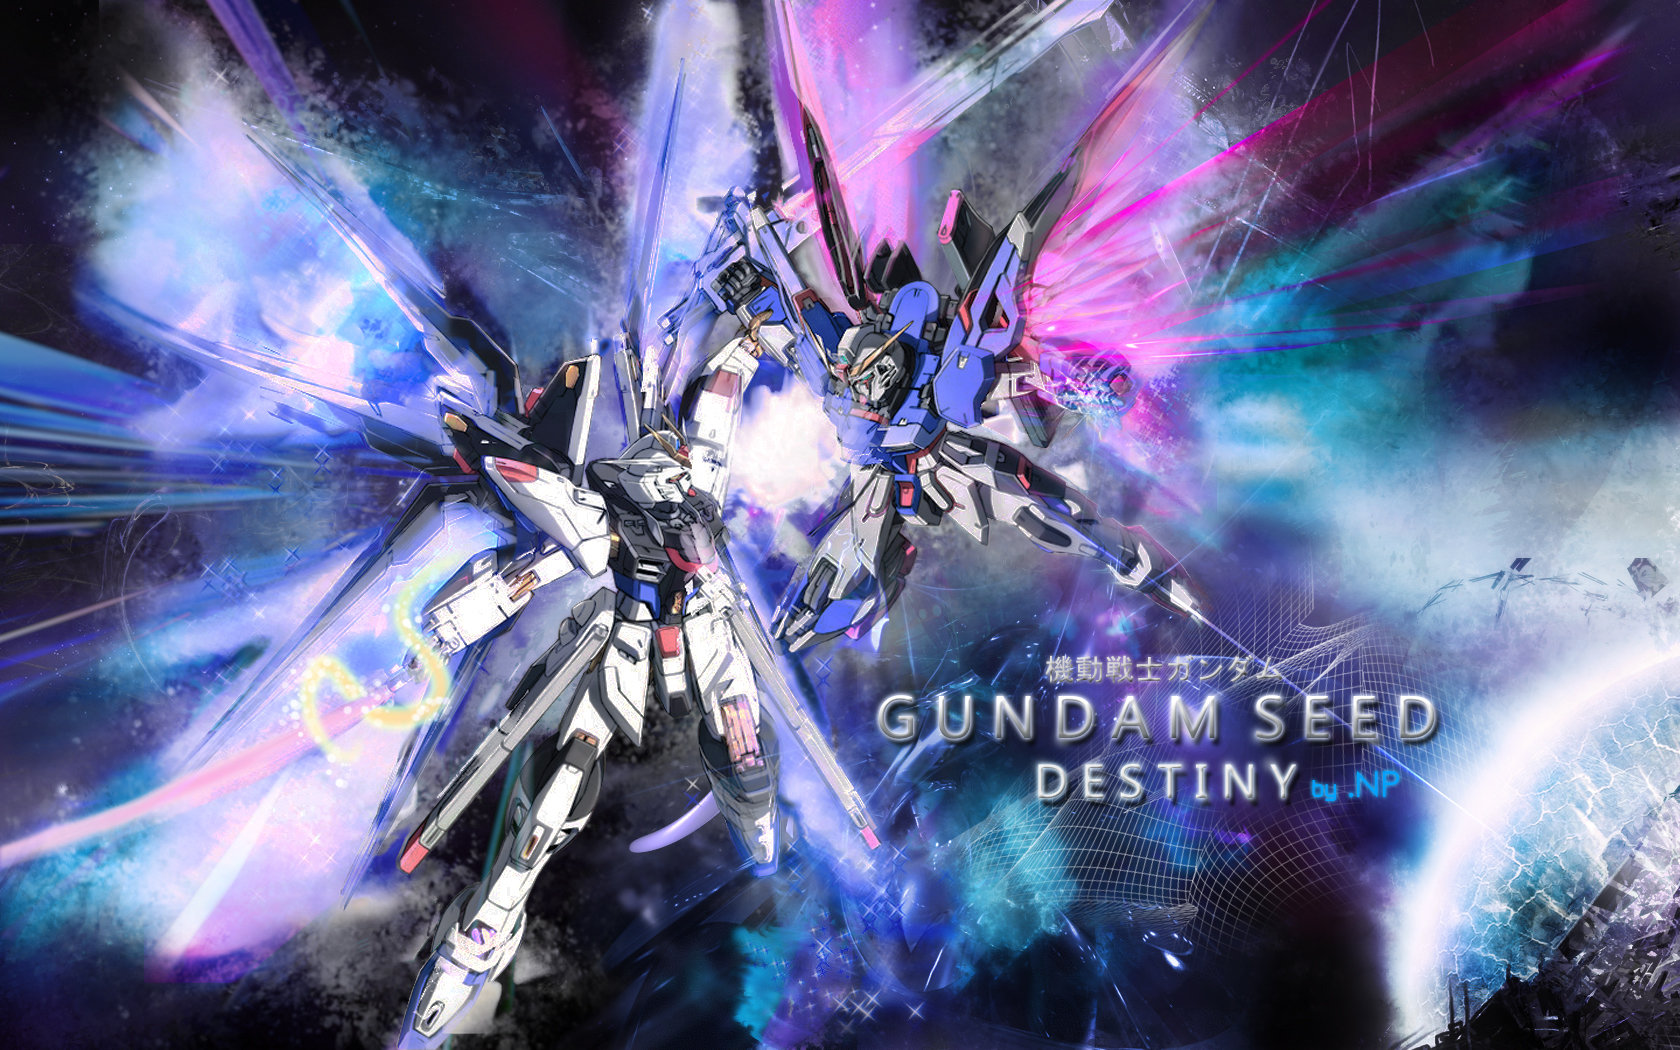 Gundam SEED Destiny by sasukenp 1680x1050